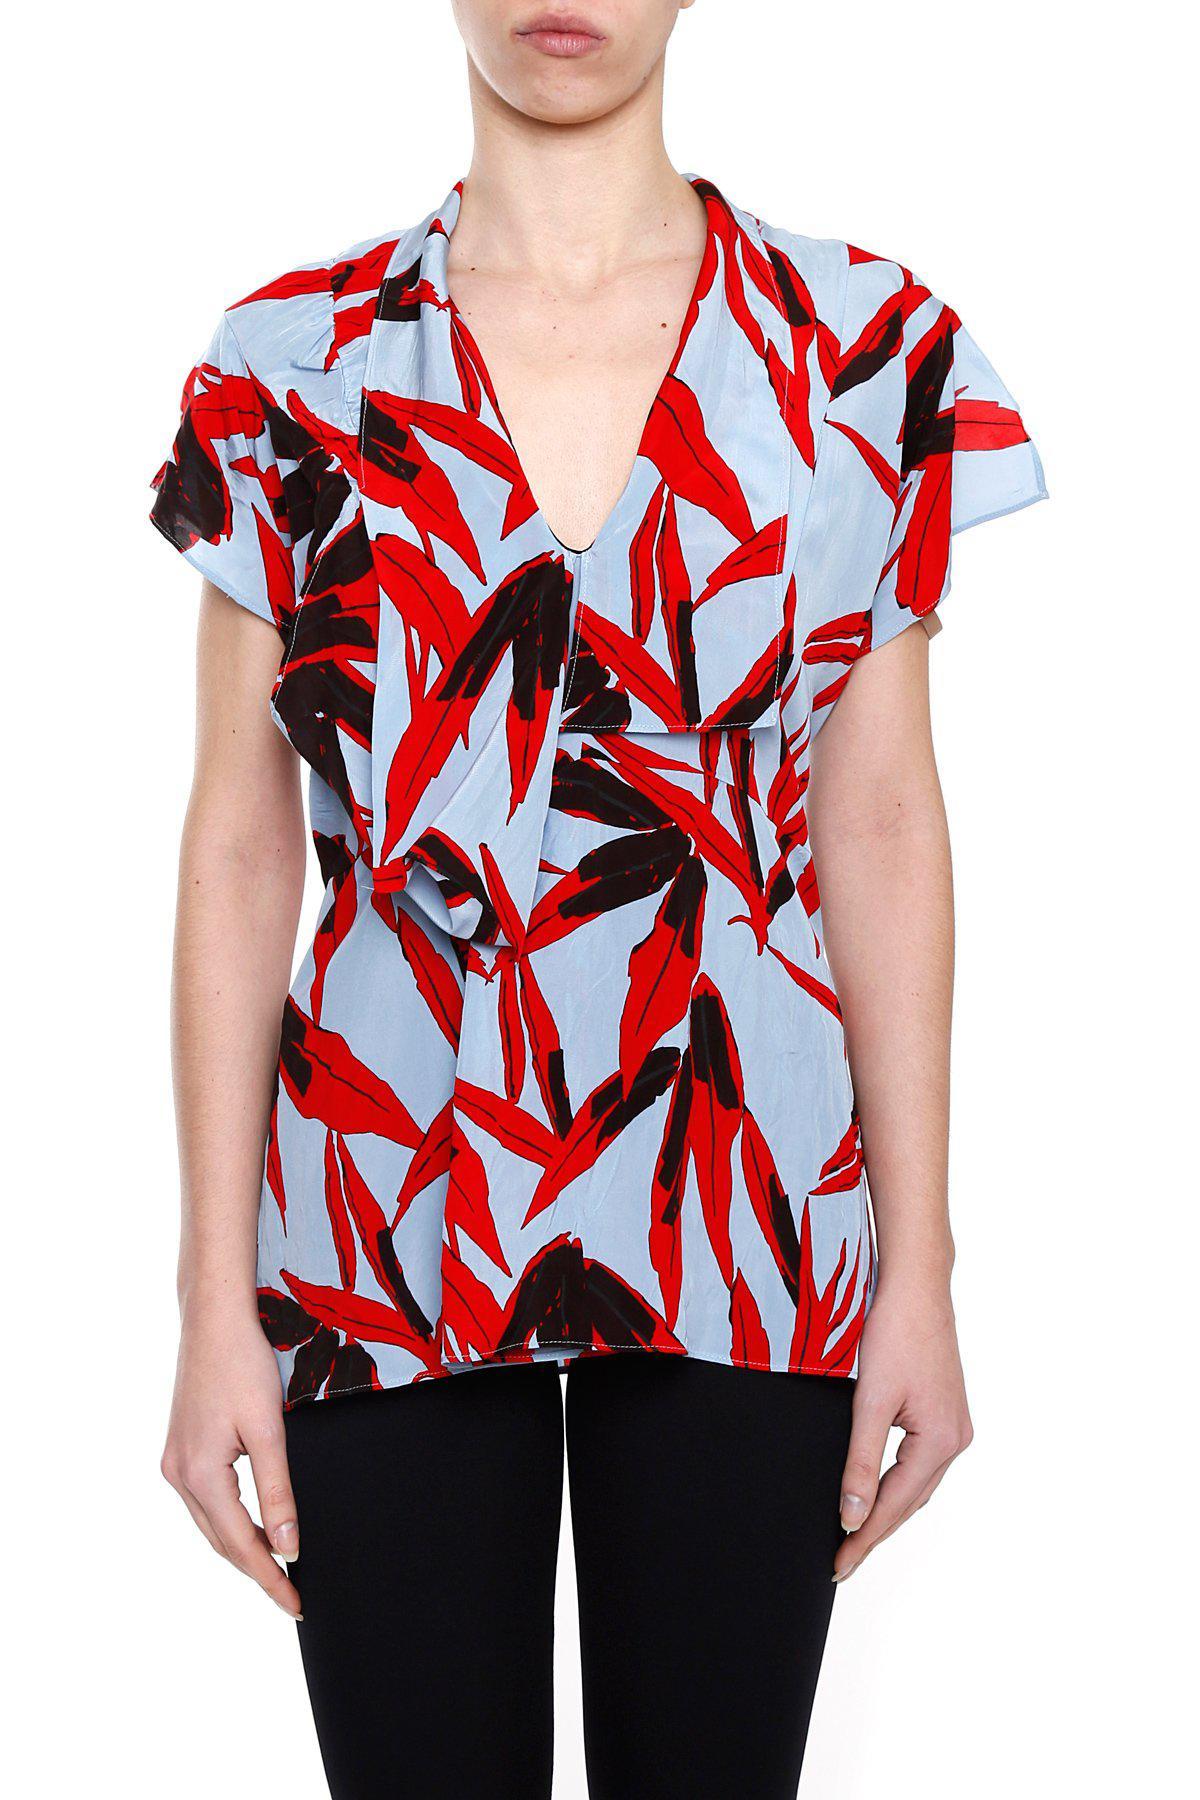 e3ea34d3f0e9fd Marni Printed Low-neck Top in Red - Lyst